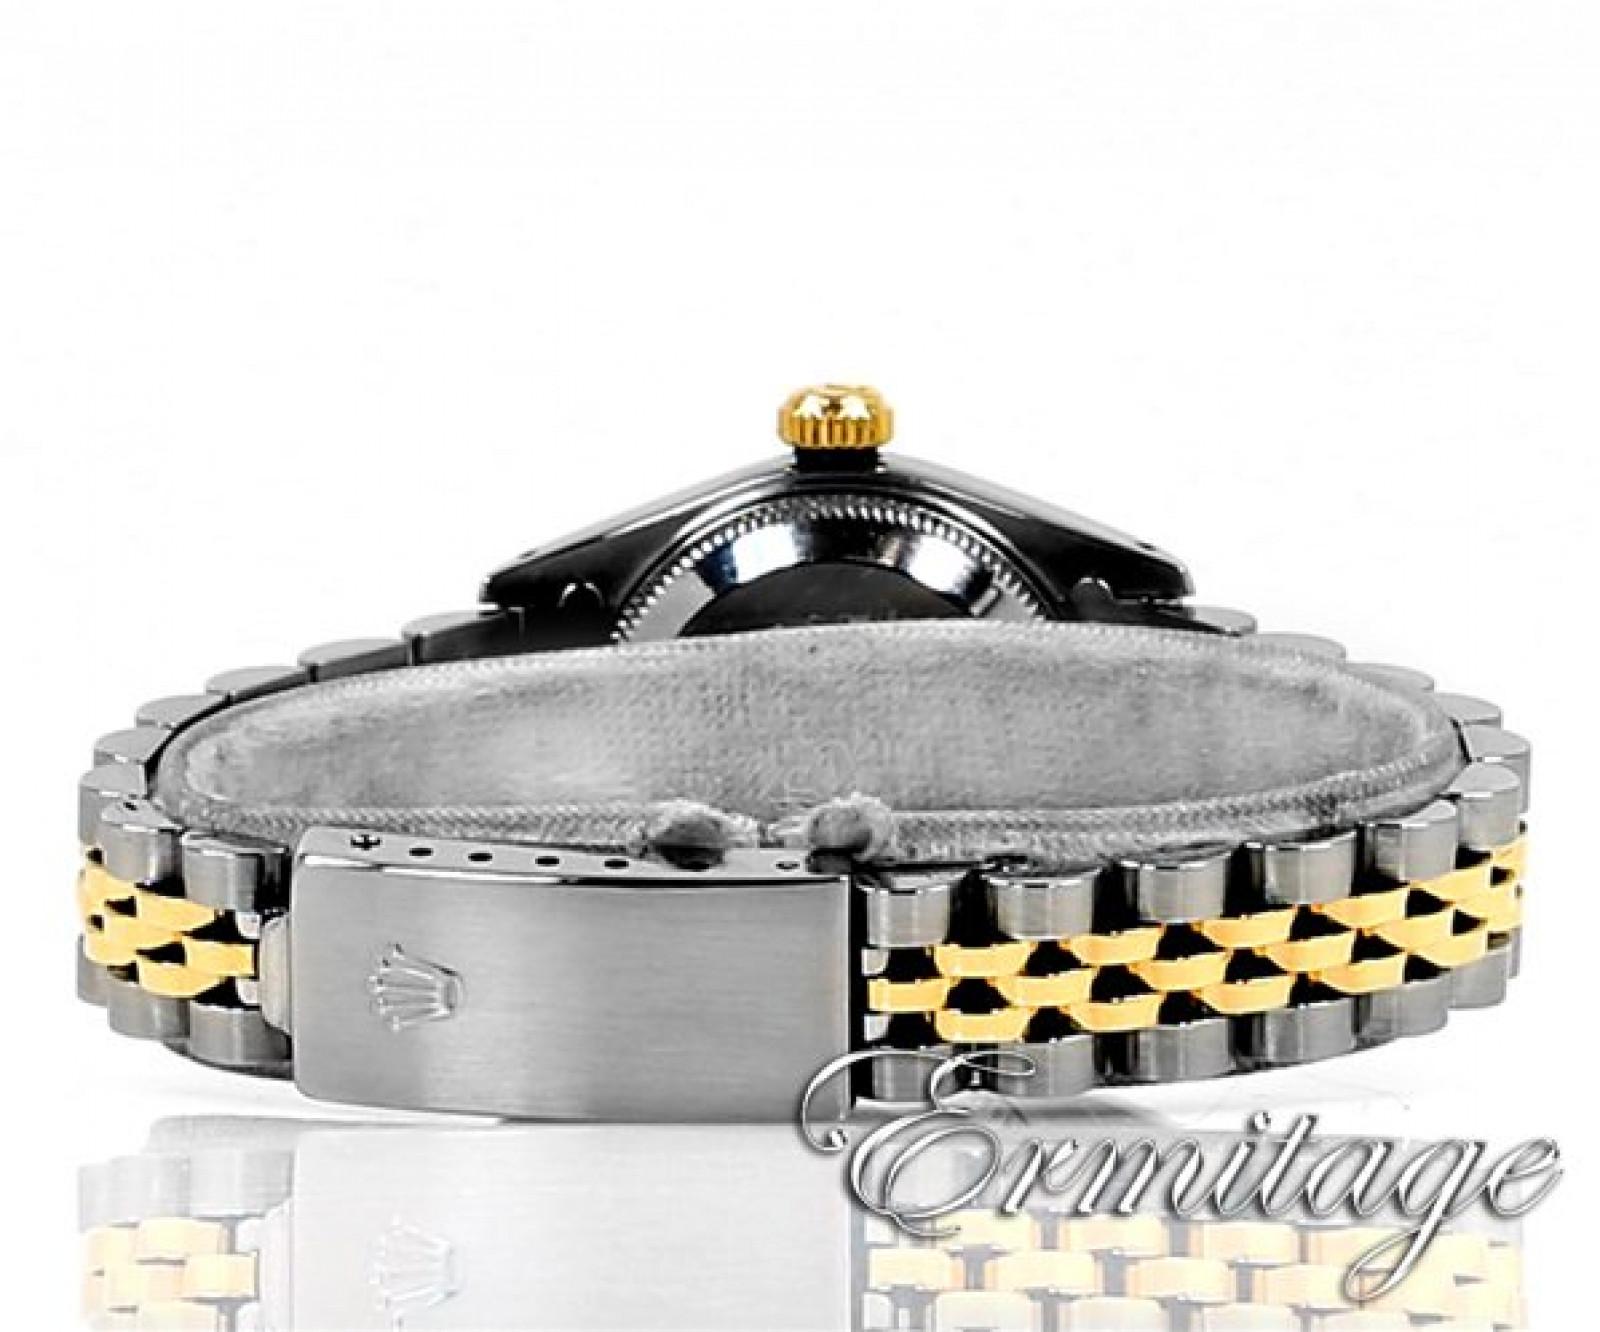 Black Diamond Dial Rolex Datejust 69173